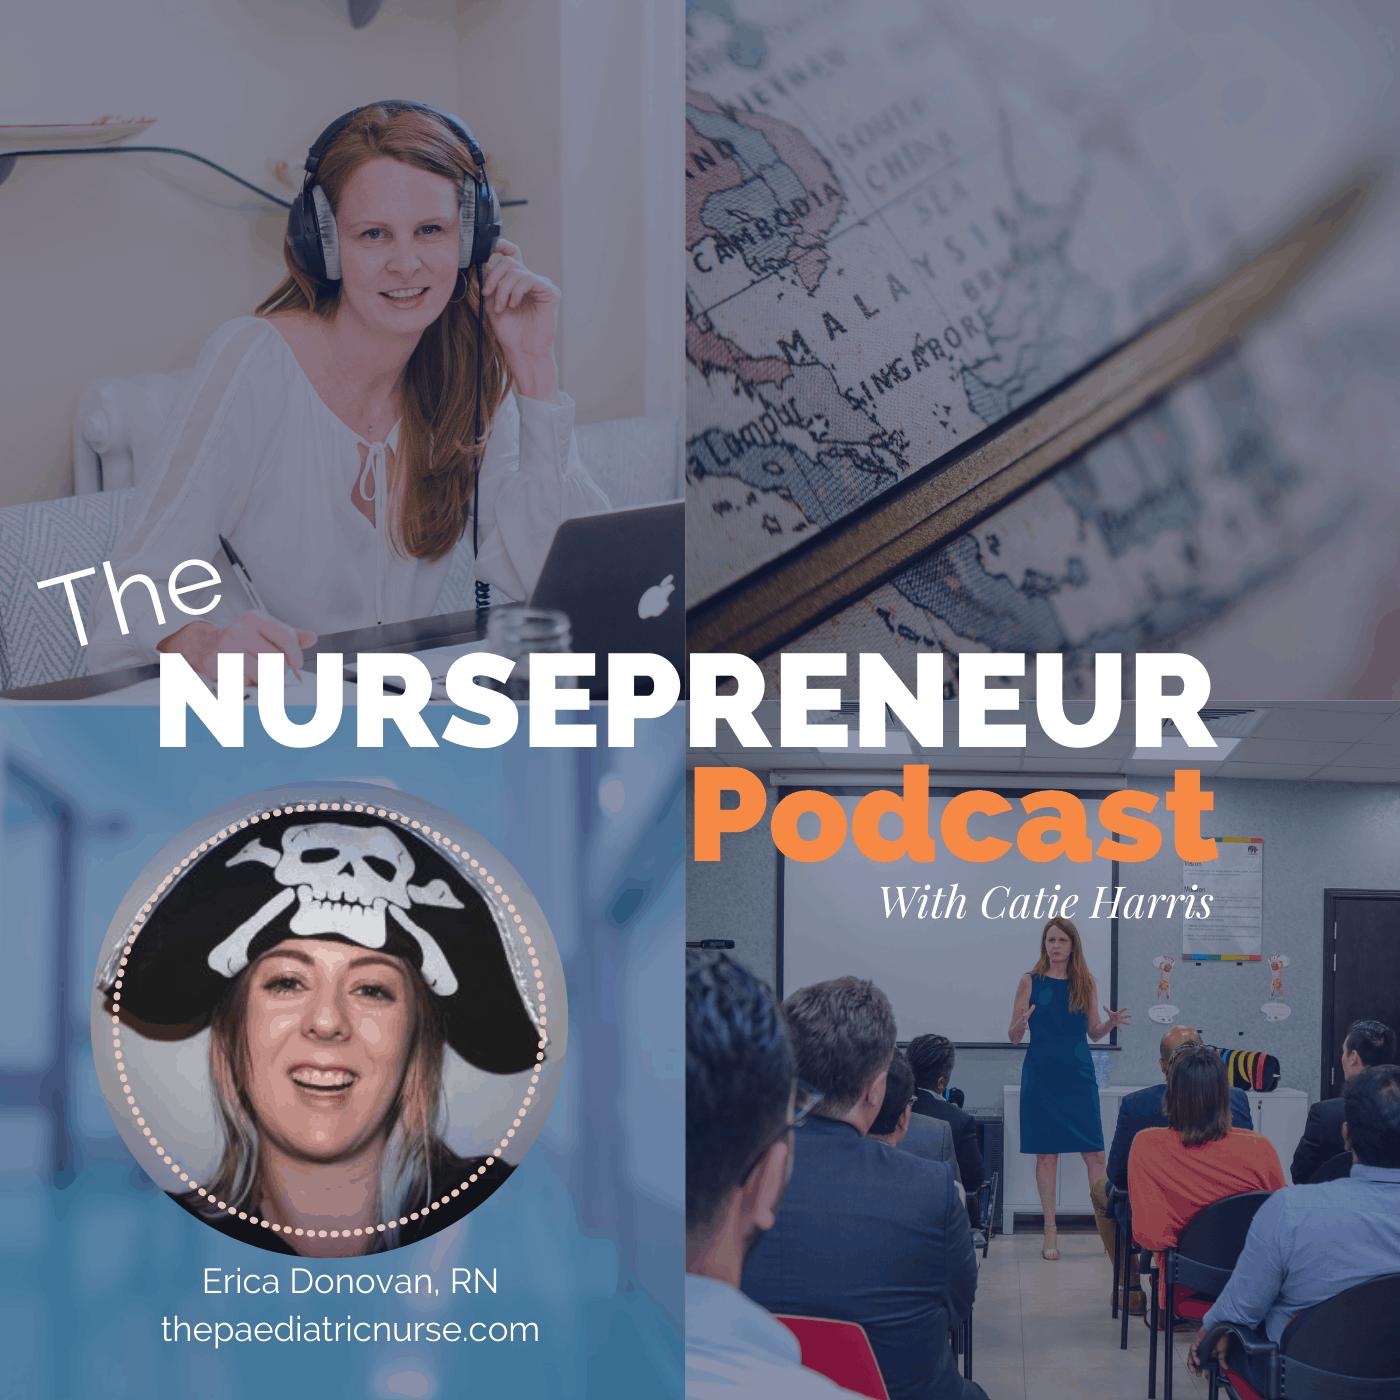 The Paediatric Nurse NursePreneur Podcast